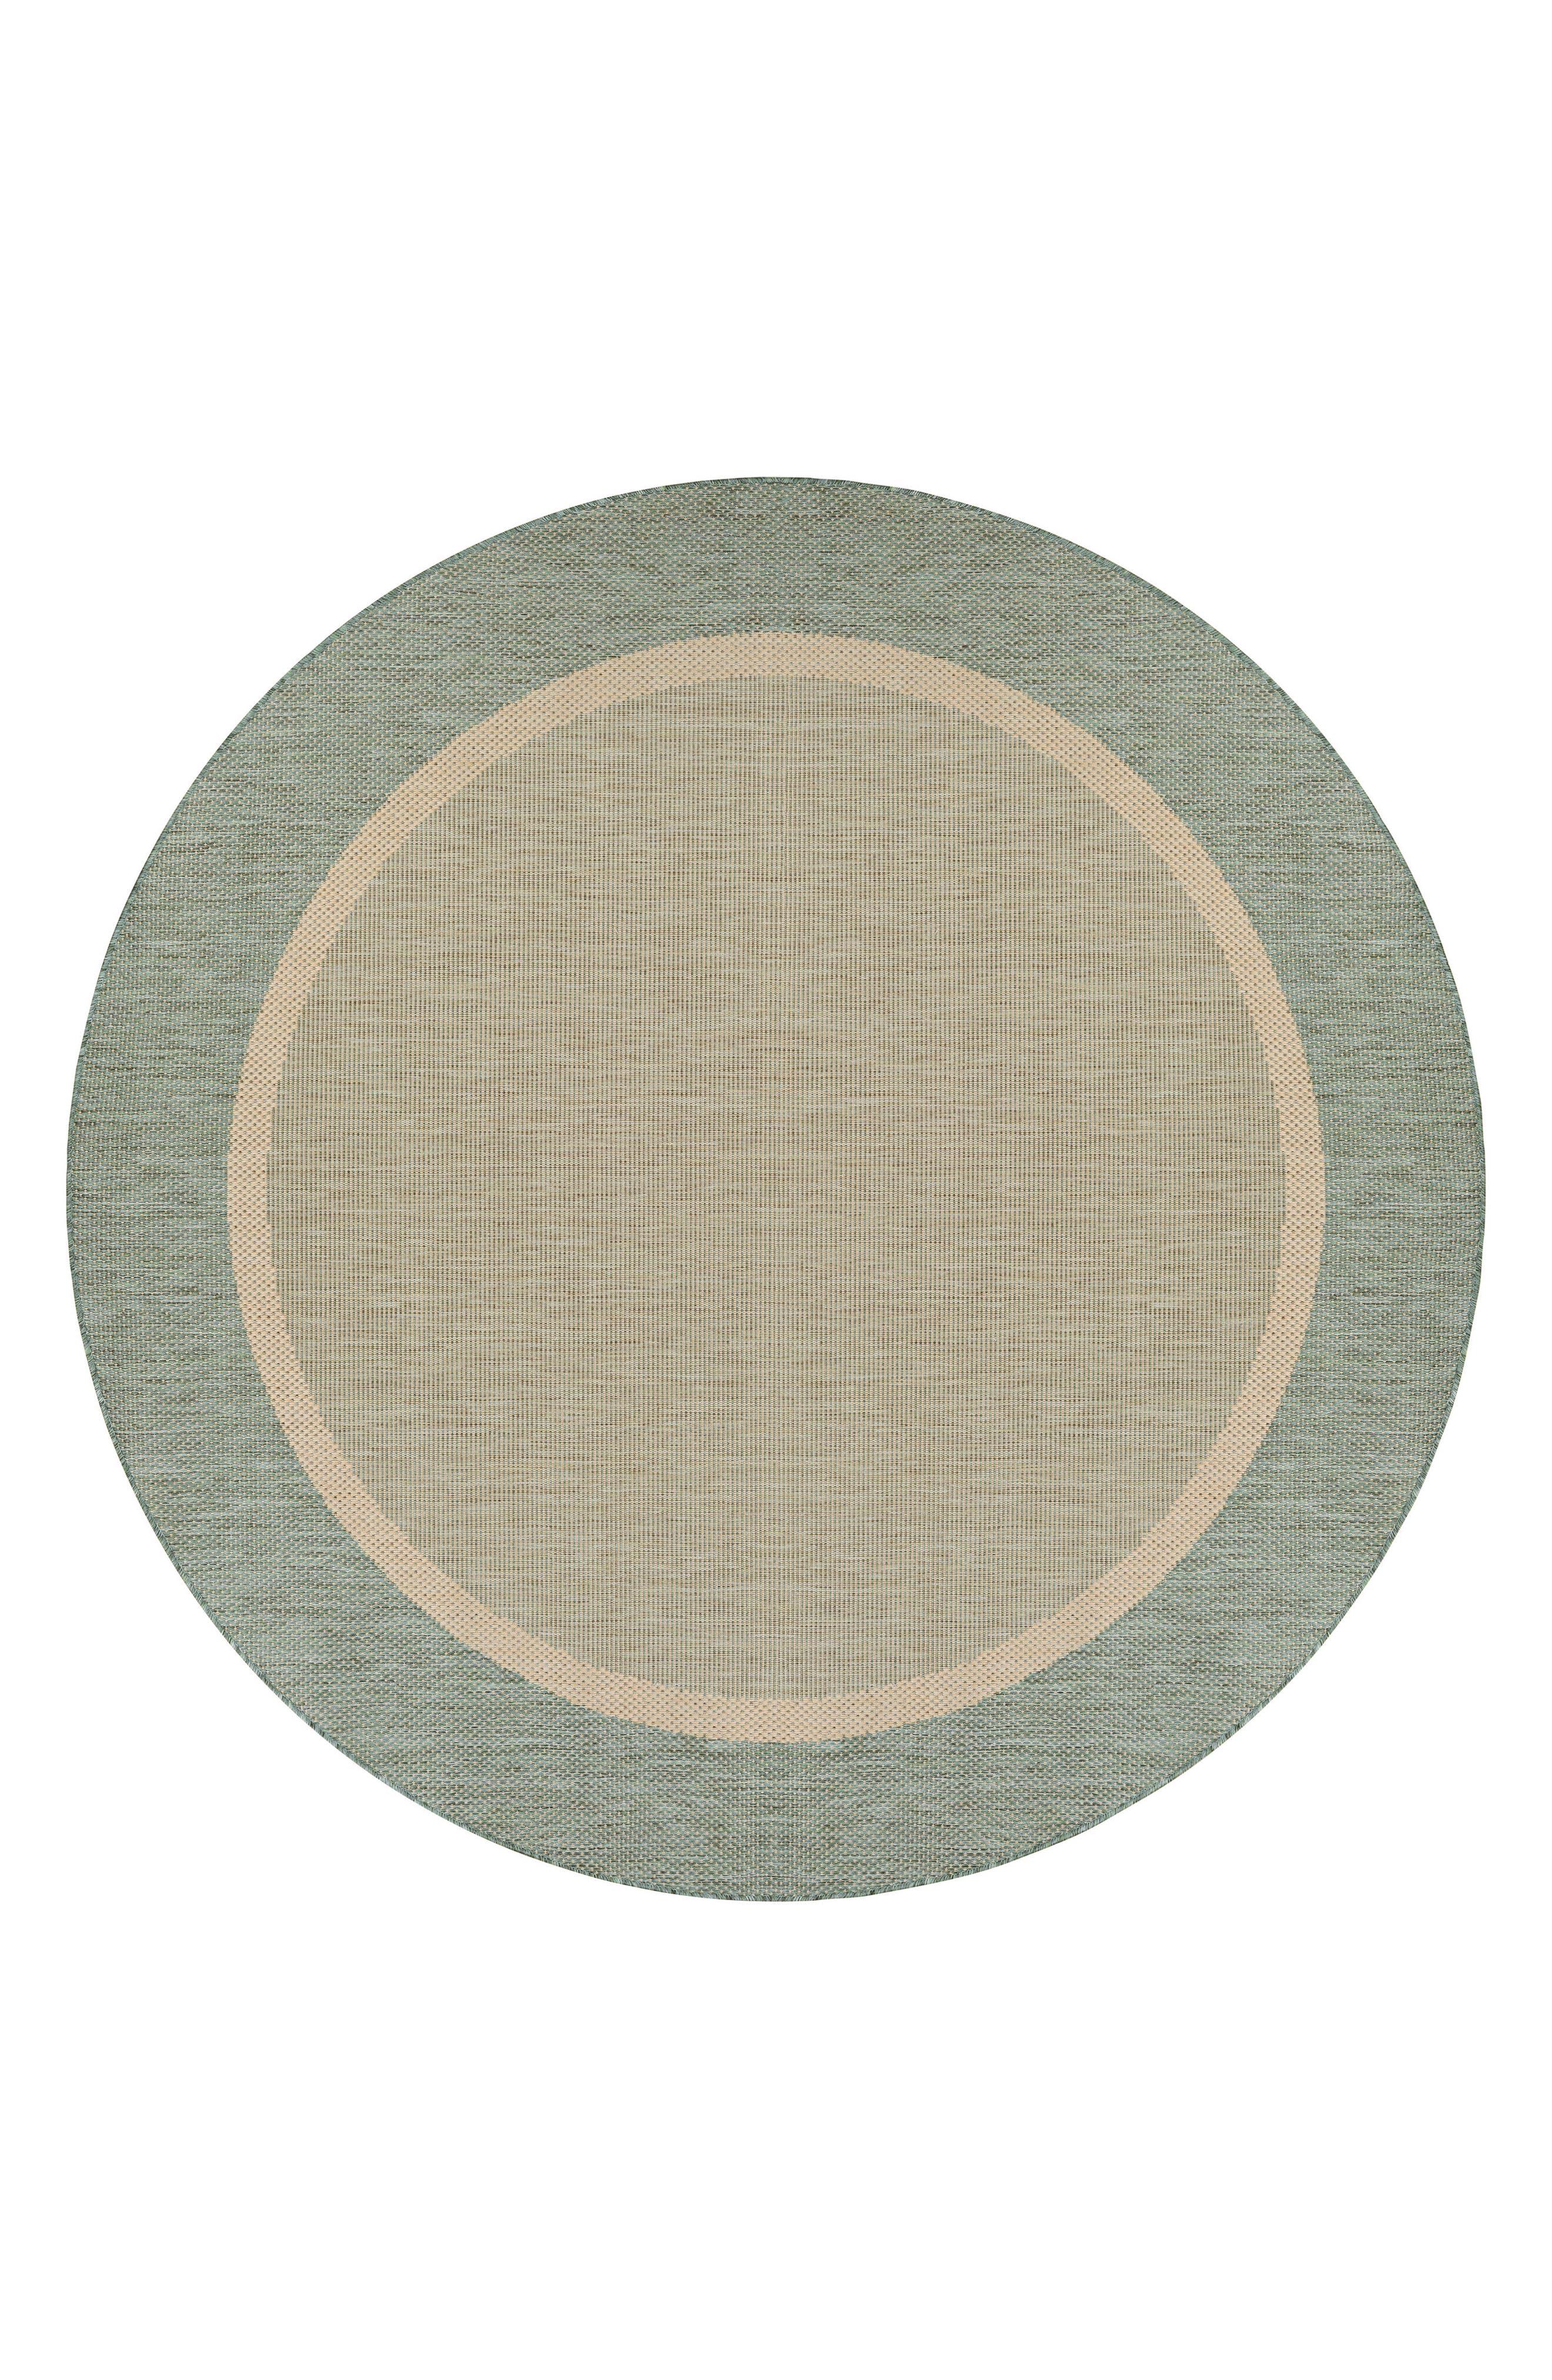 Stria Texture Indoor/Outdoor Rug,                             Alternate thumbnail 2, color,                             NATURAL/ GREEN